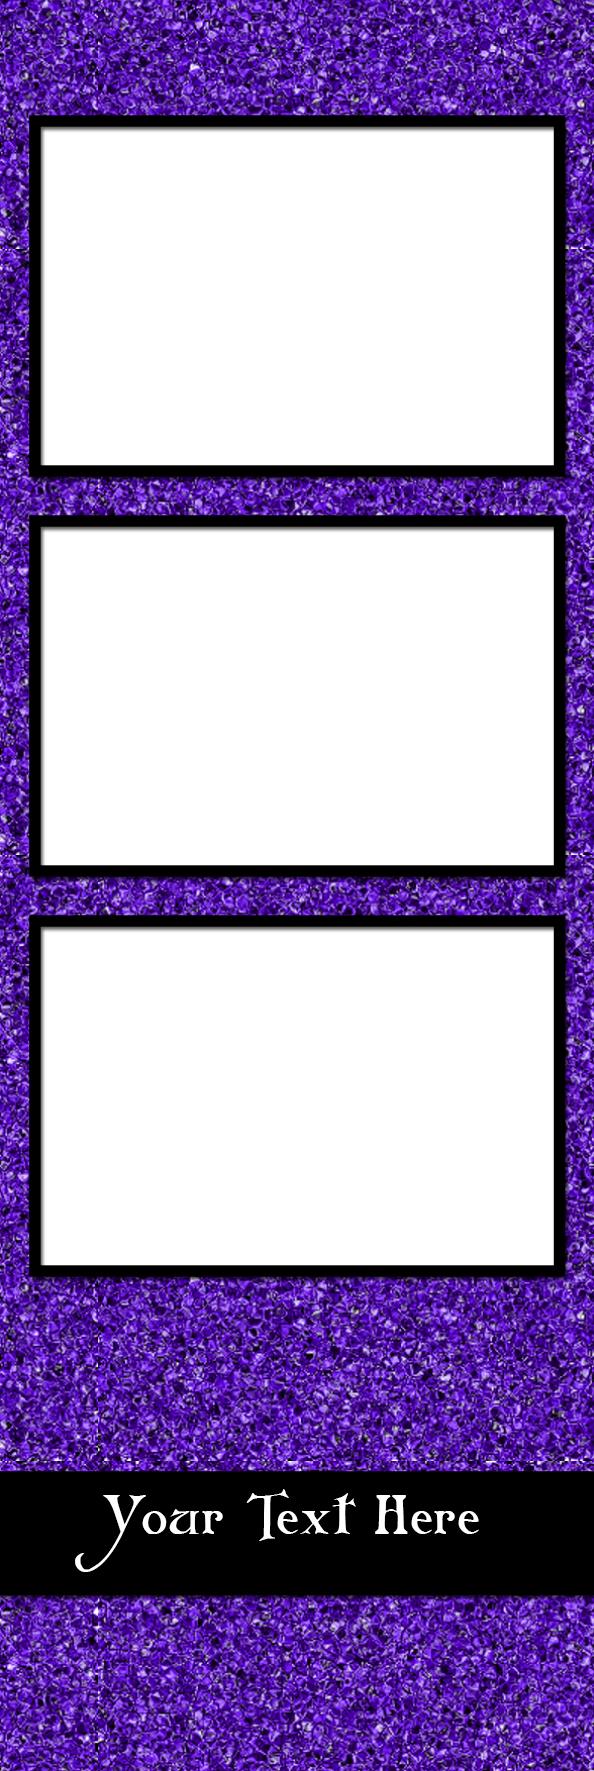 Texture_Glitter-V-6P10.jpg